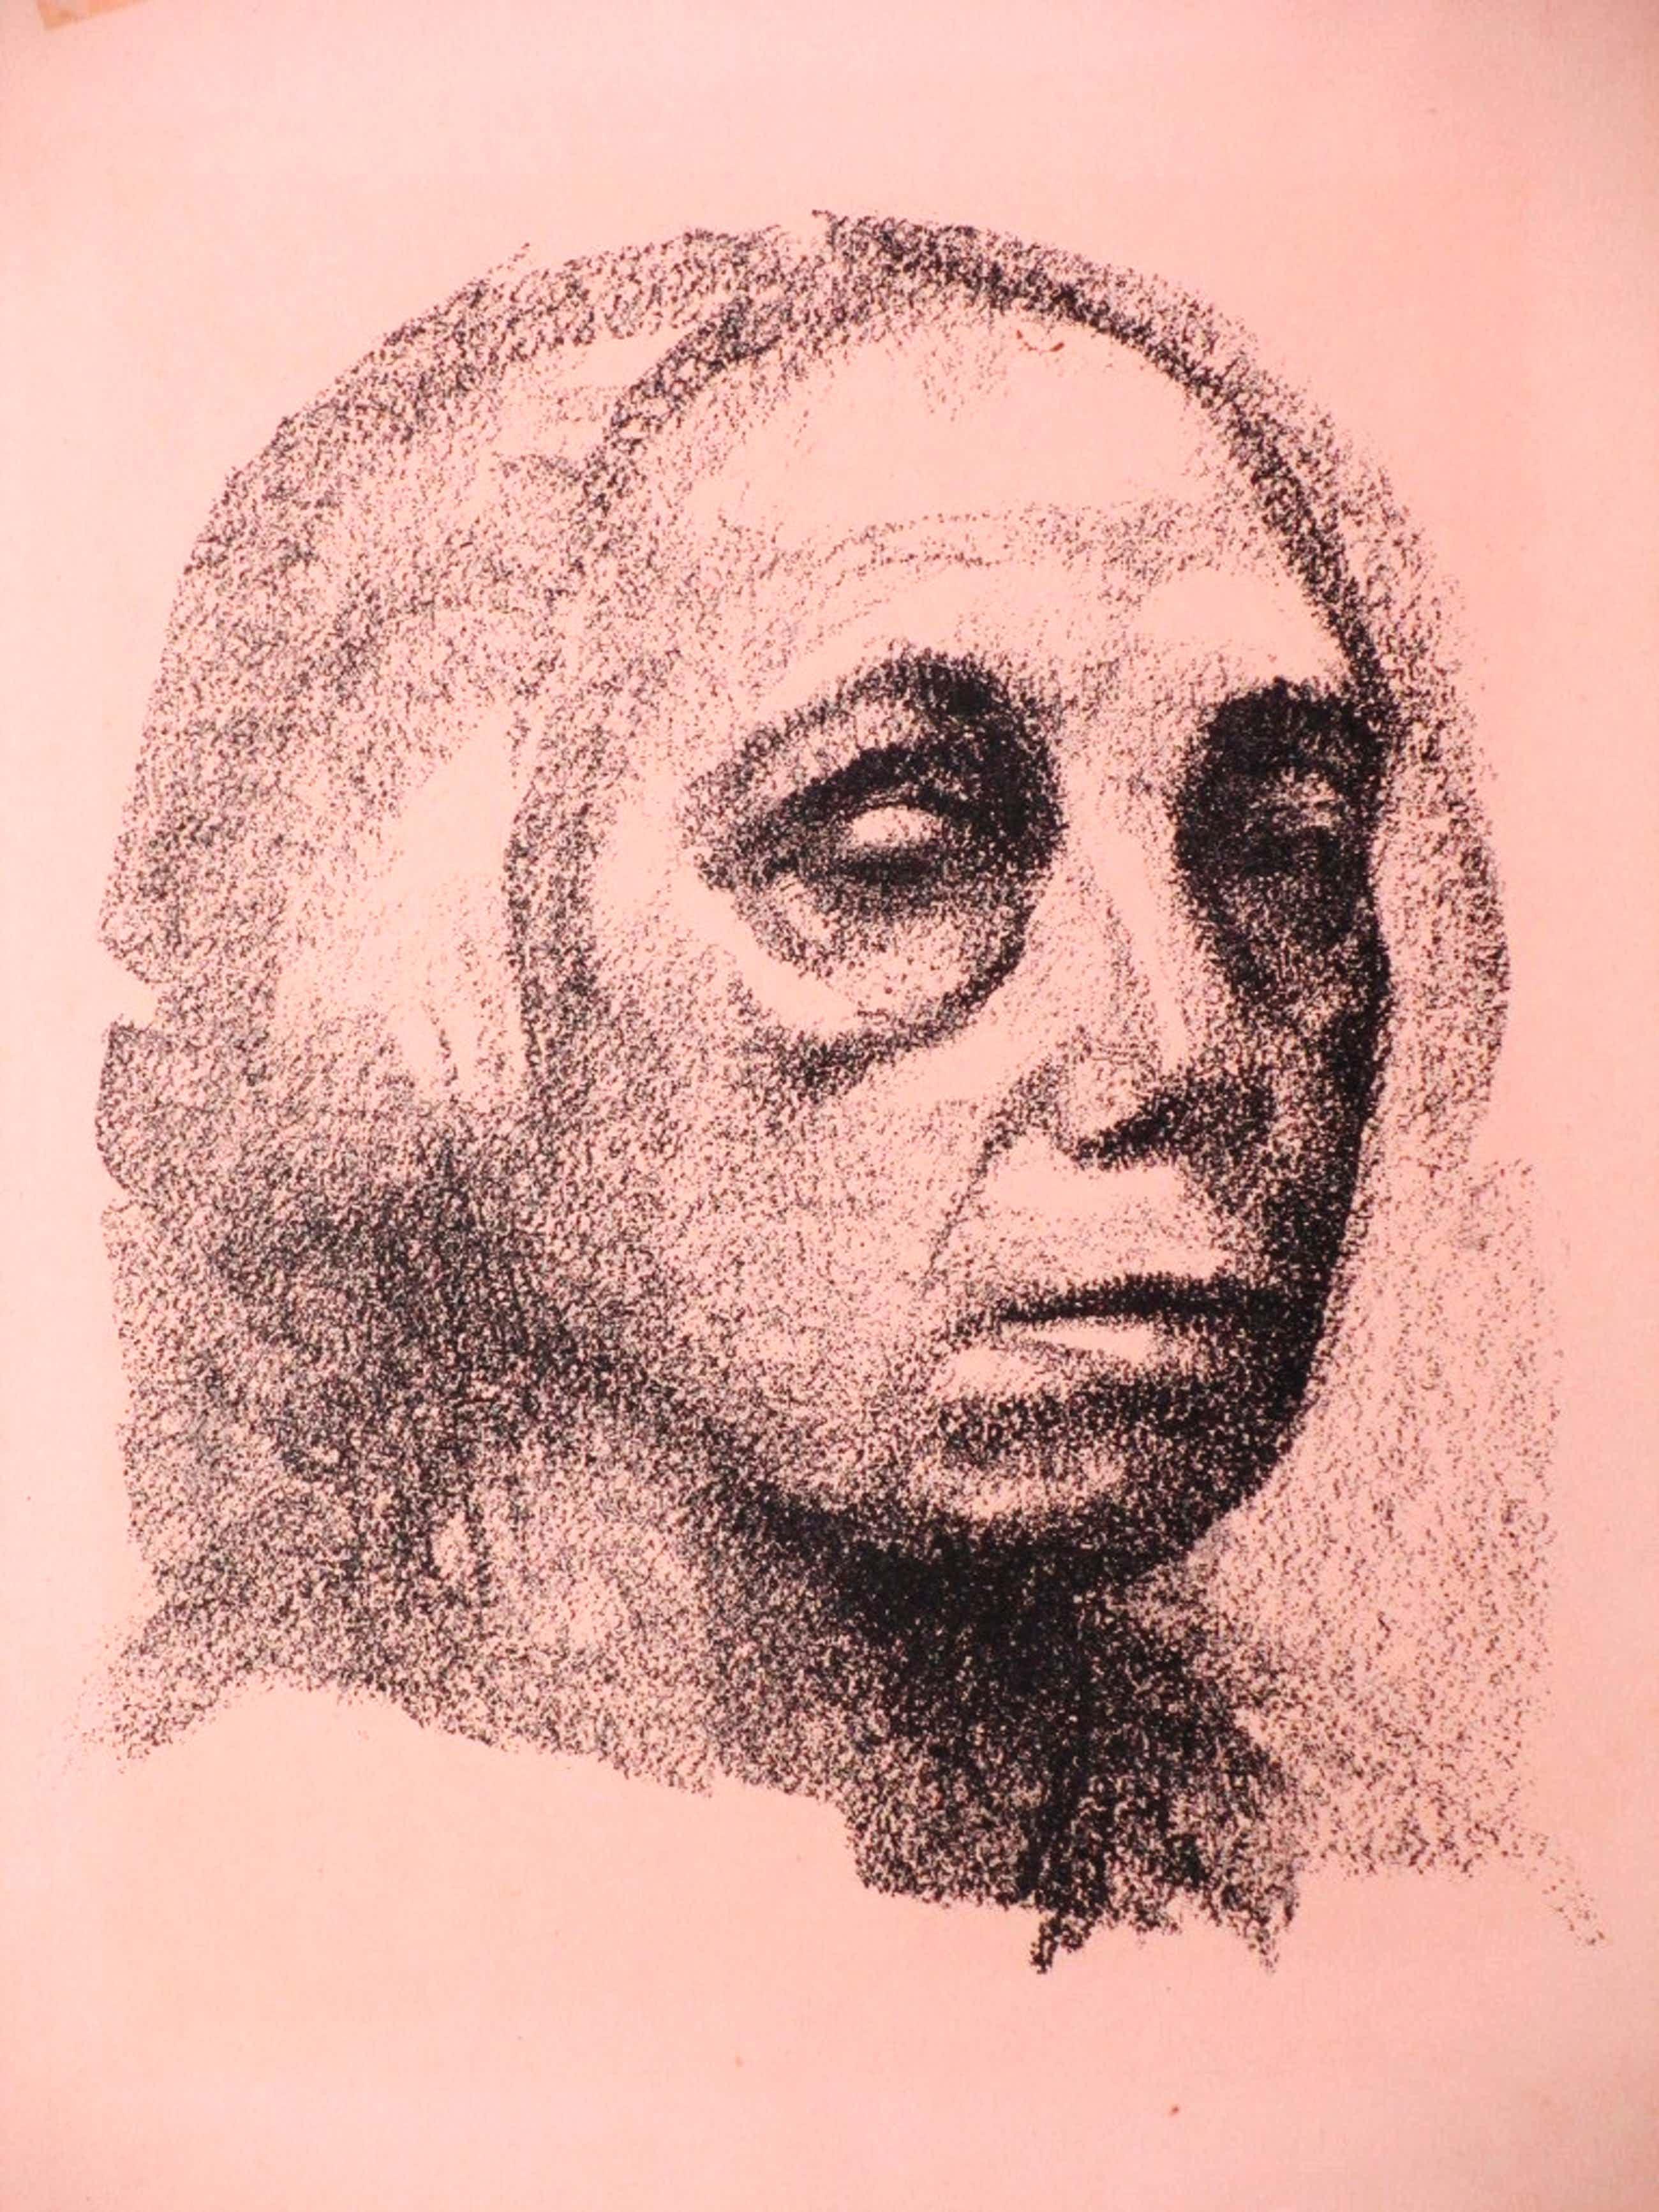 Kathe Kollwitz, Zelfportret, Lithografie kopen? Bied vanaf 81!